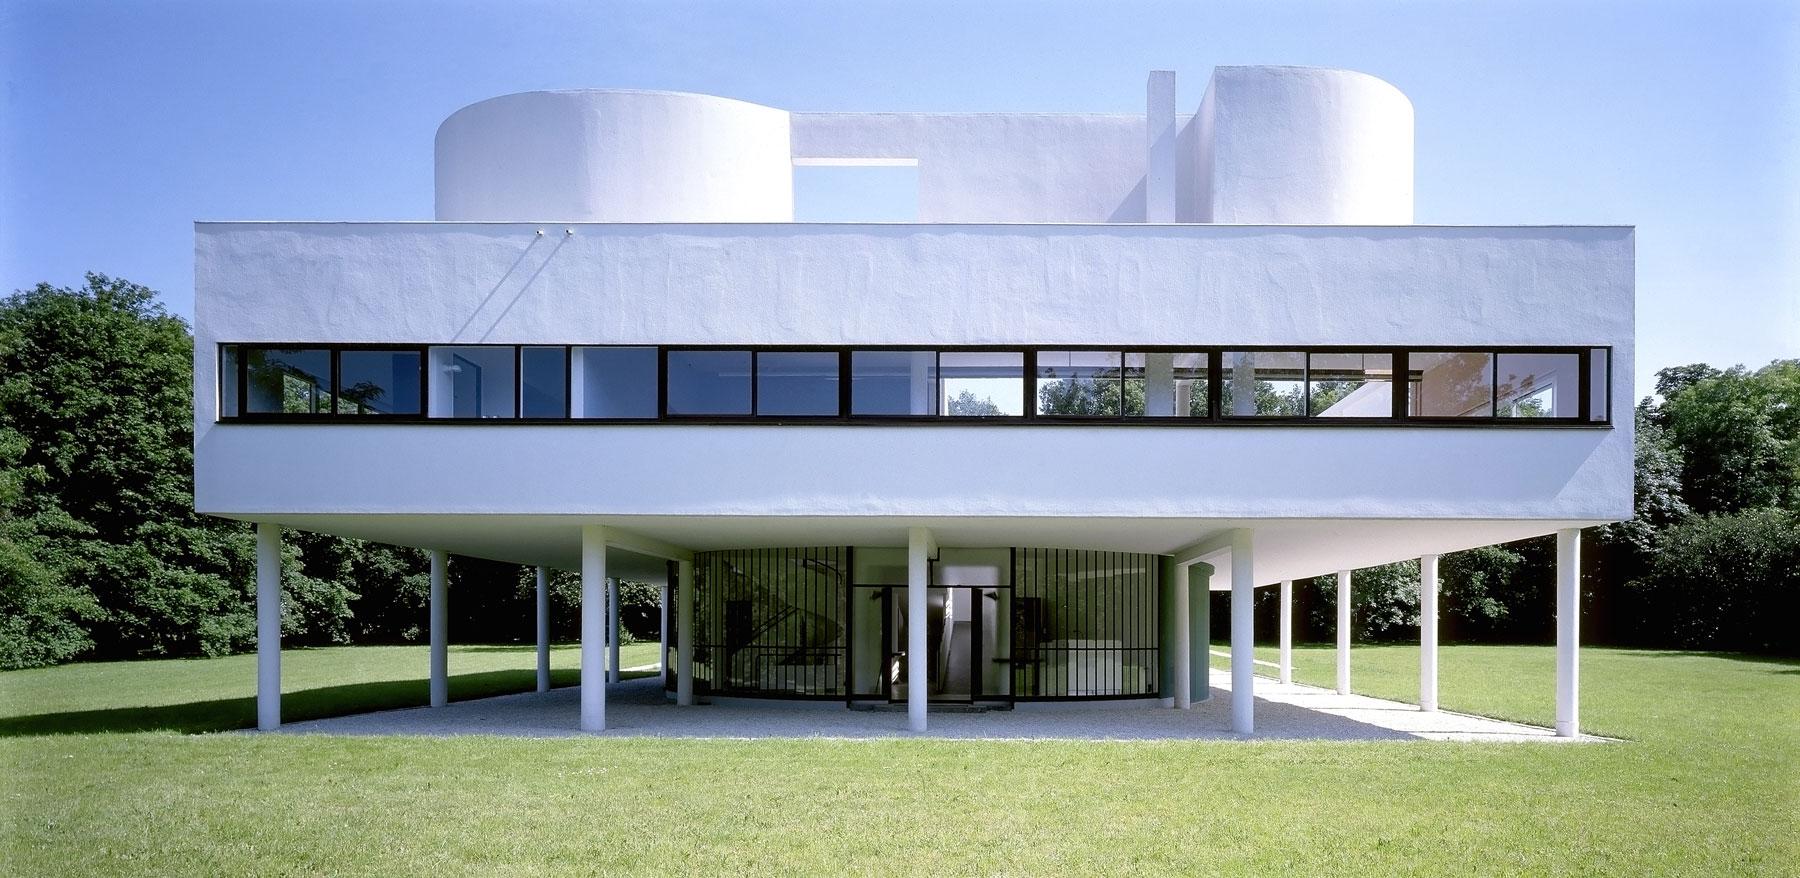 A vila savoye vaideplastica - La villa savoye wikipedia ...